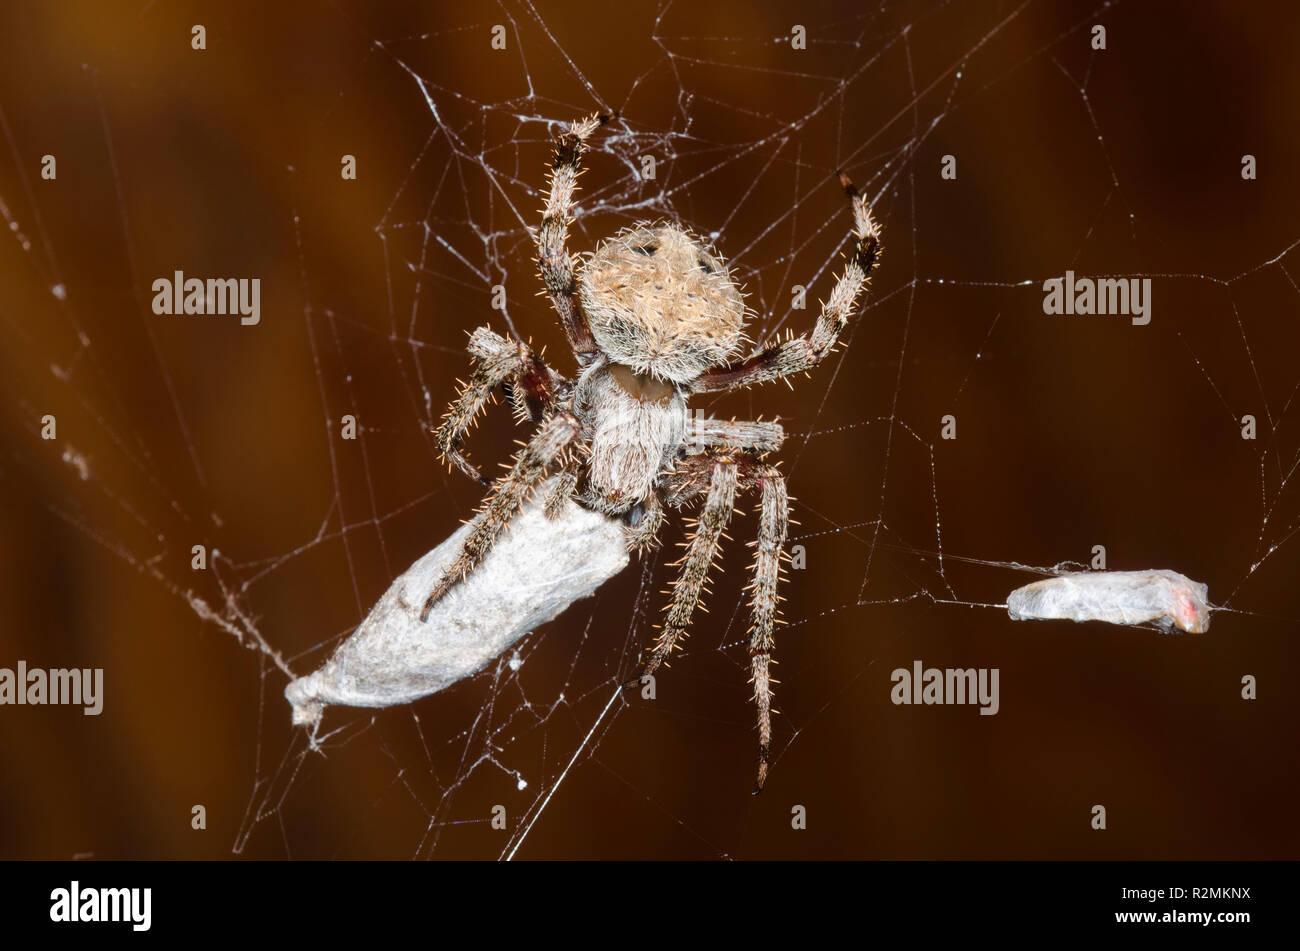 Spotted Orbweaver, Neoscona crucifera, with prey - Stock Image